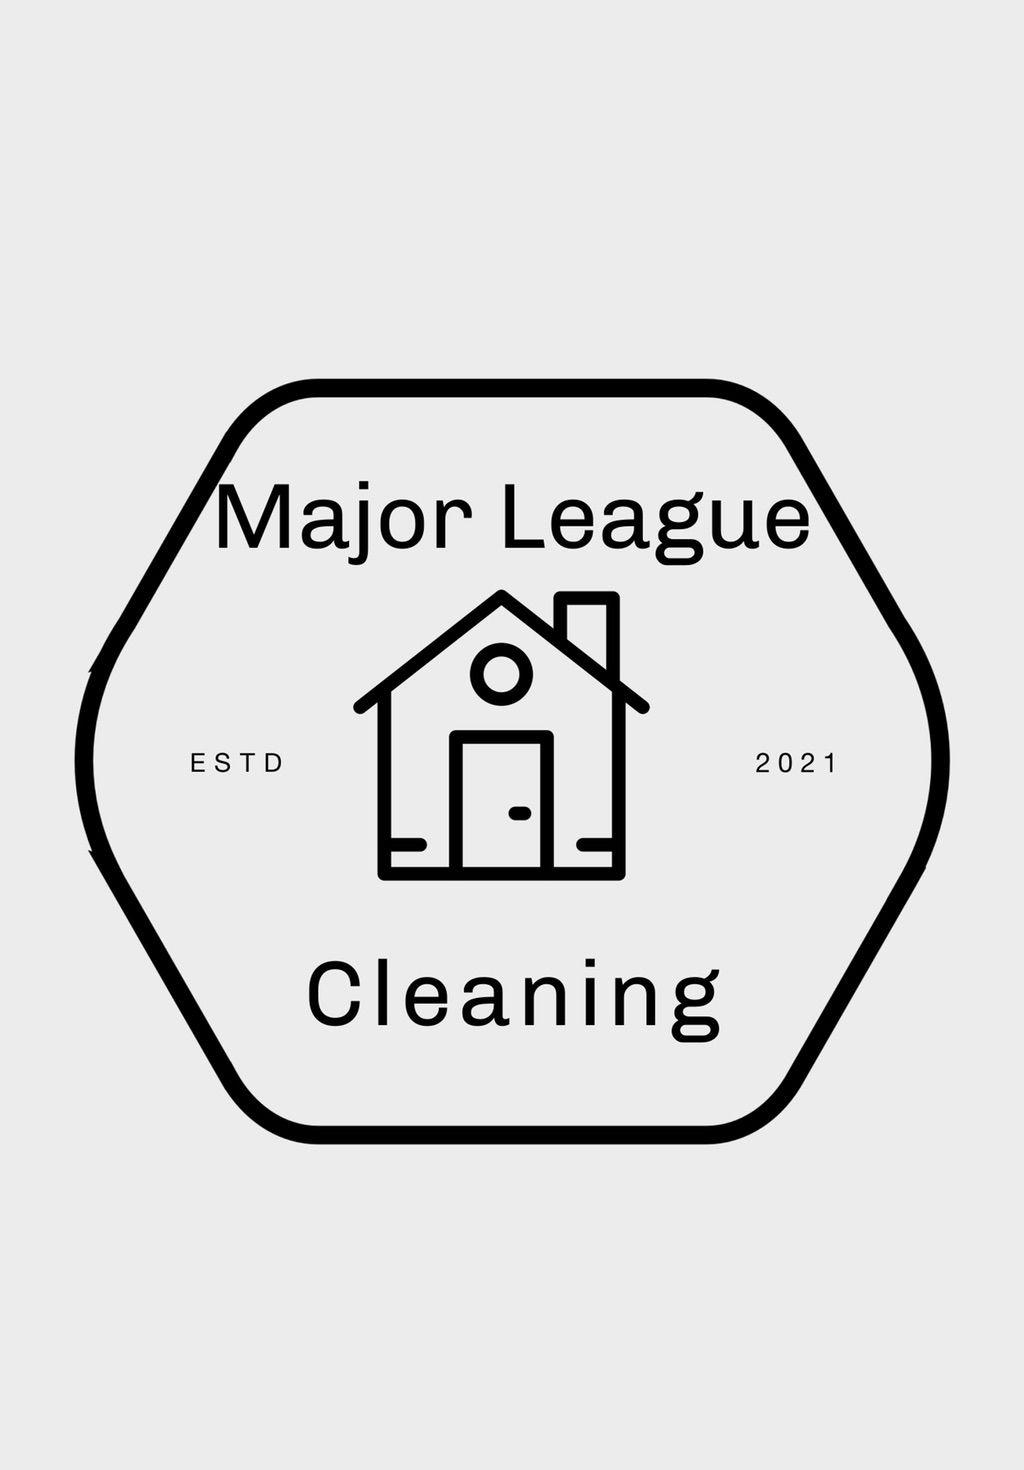 Major League Moving